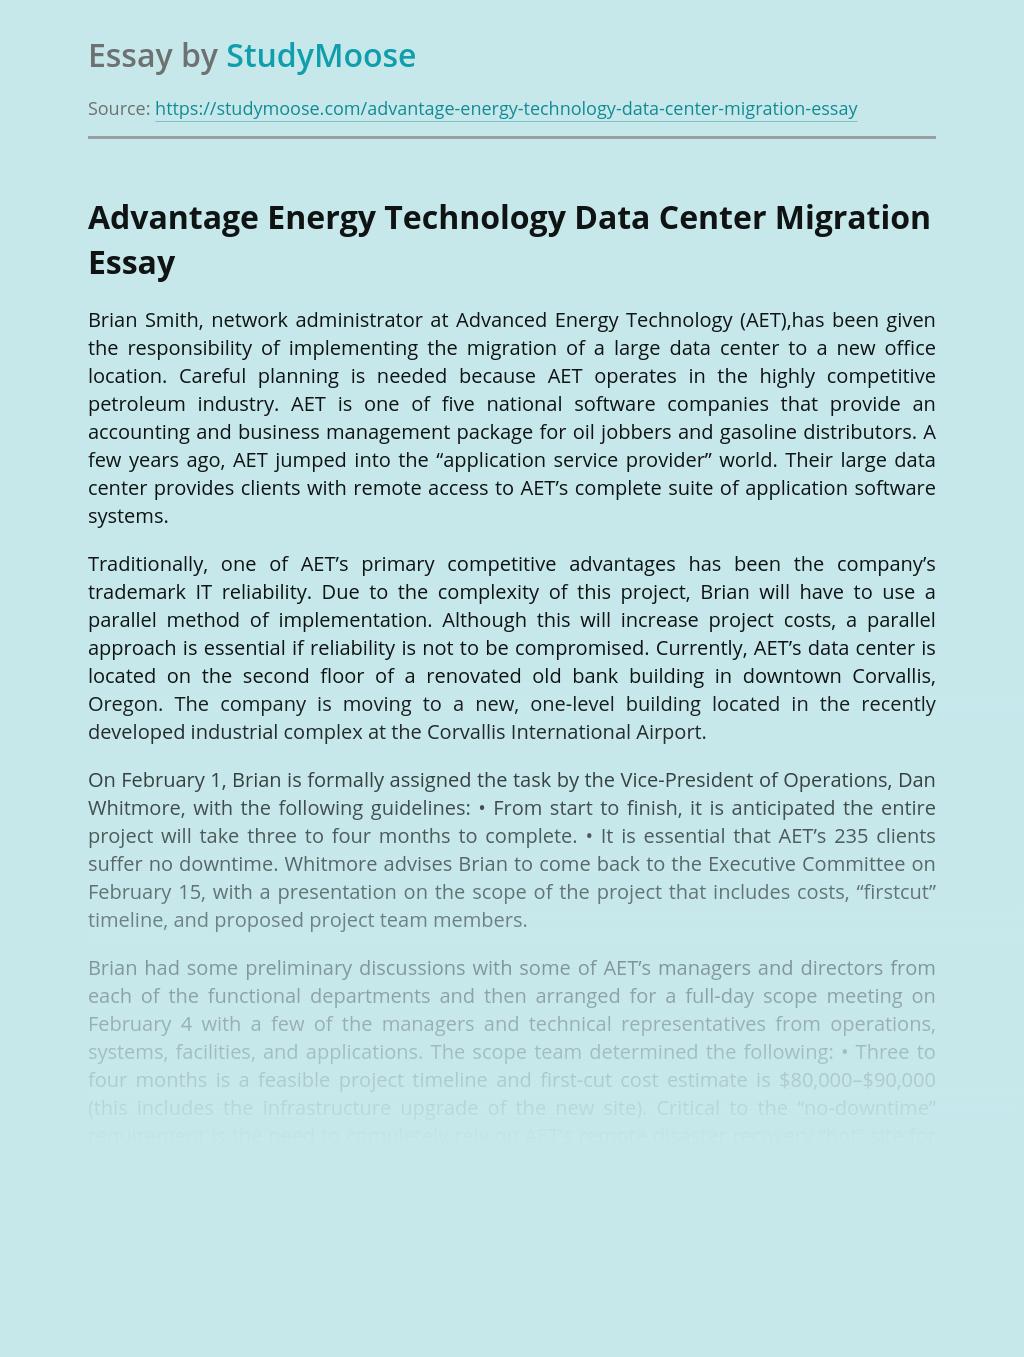 Advantage Energy Technology Data Center Migration